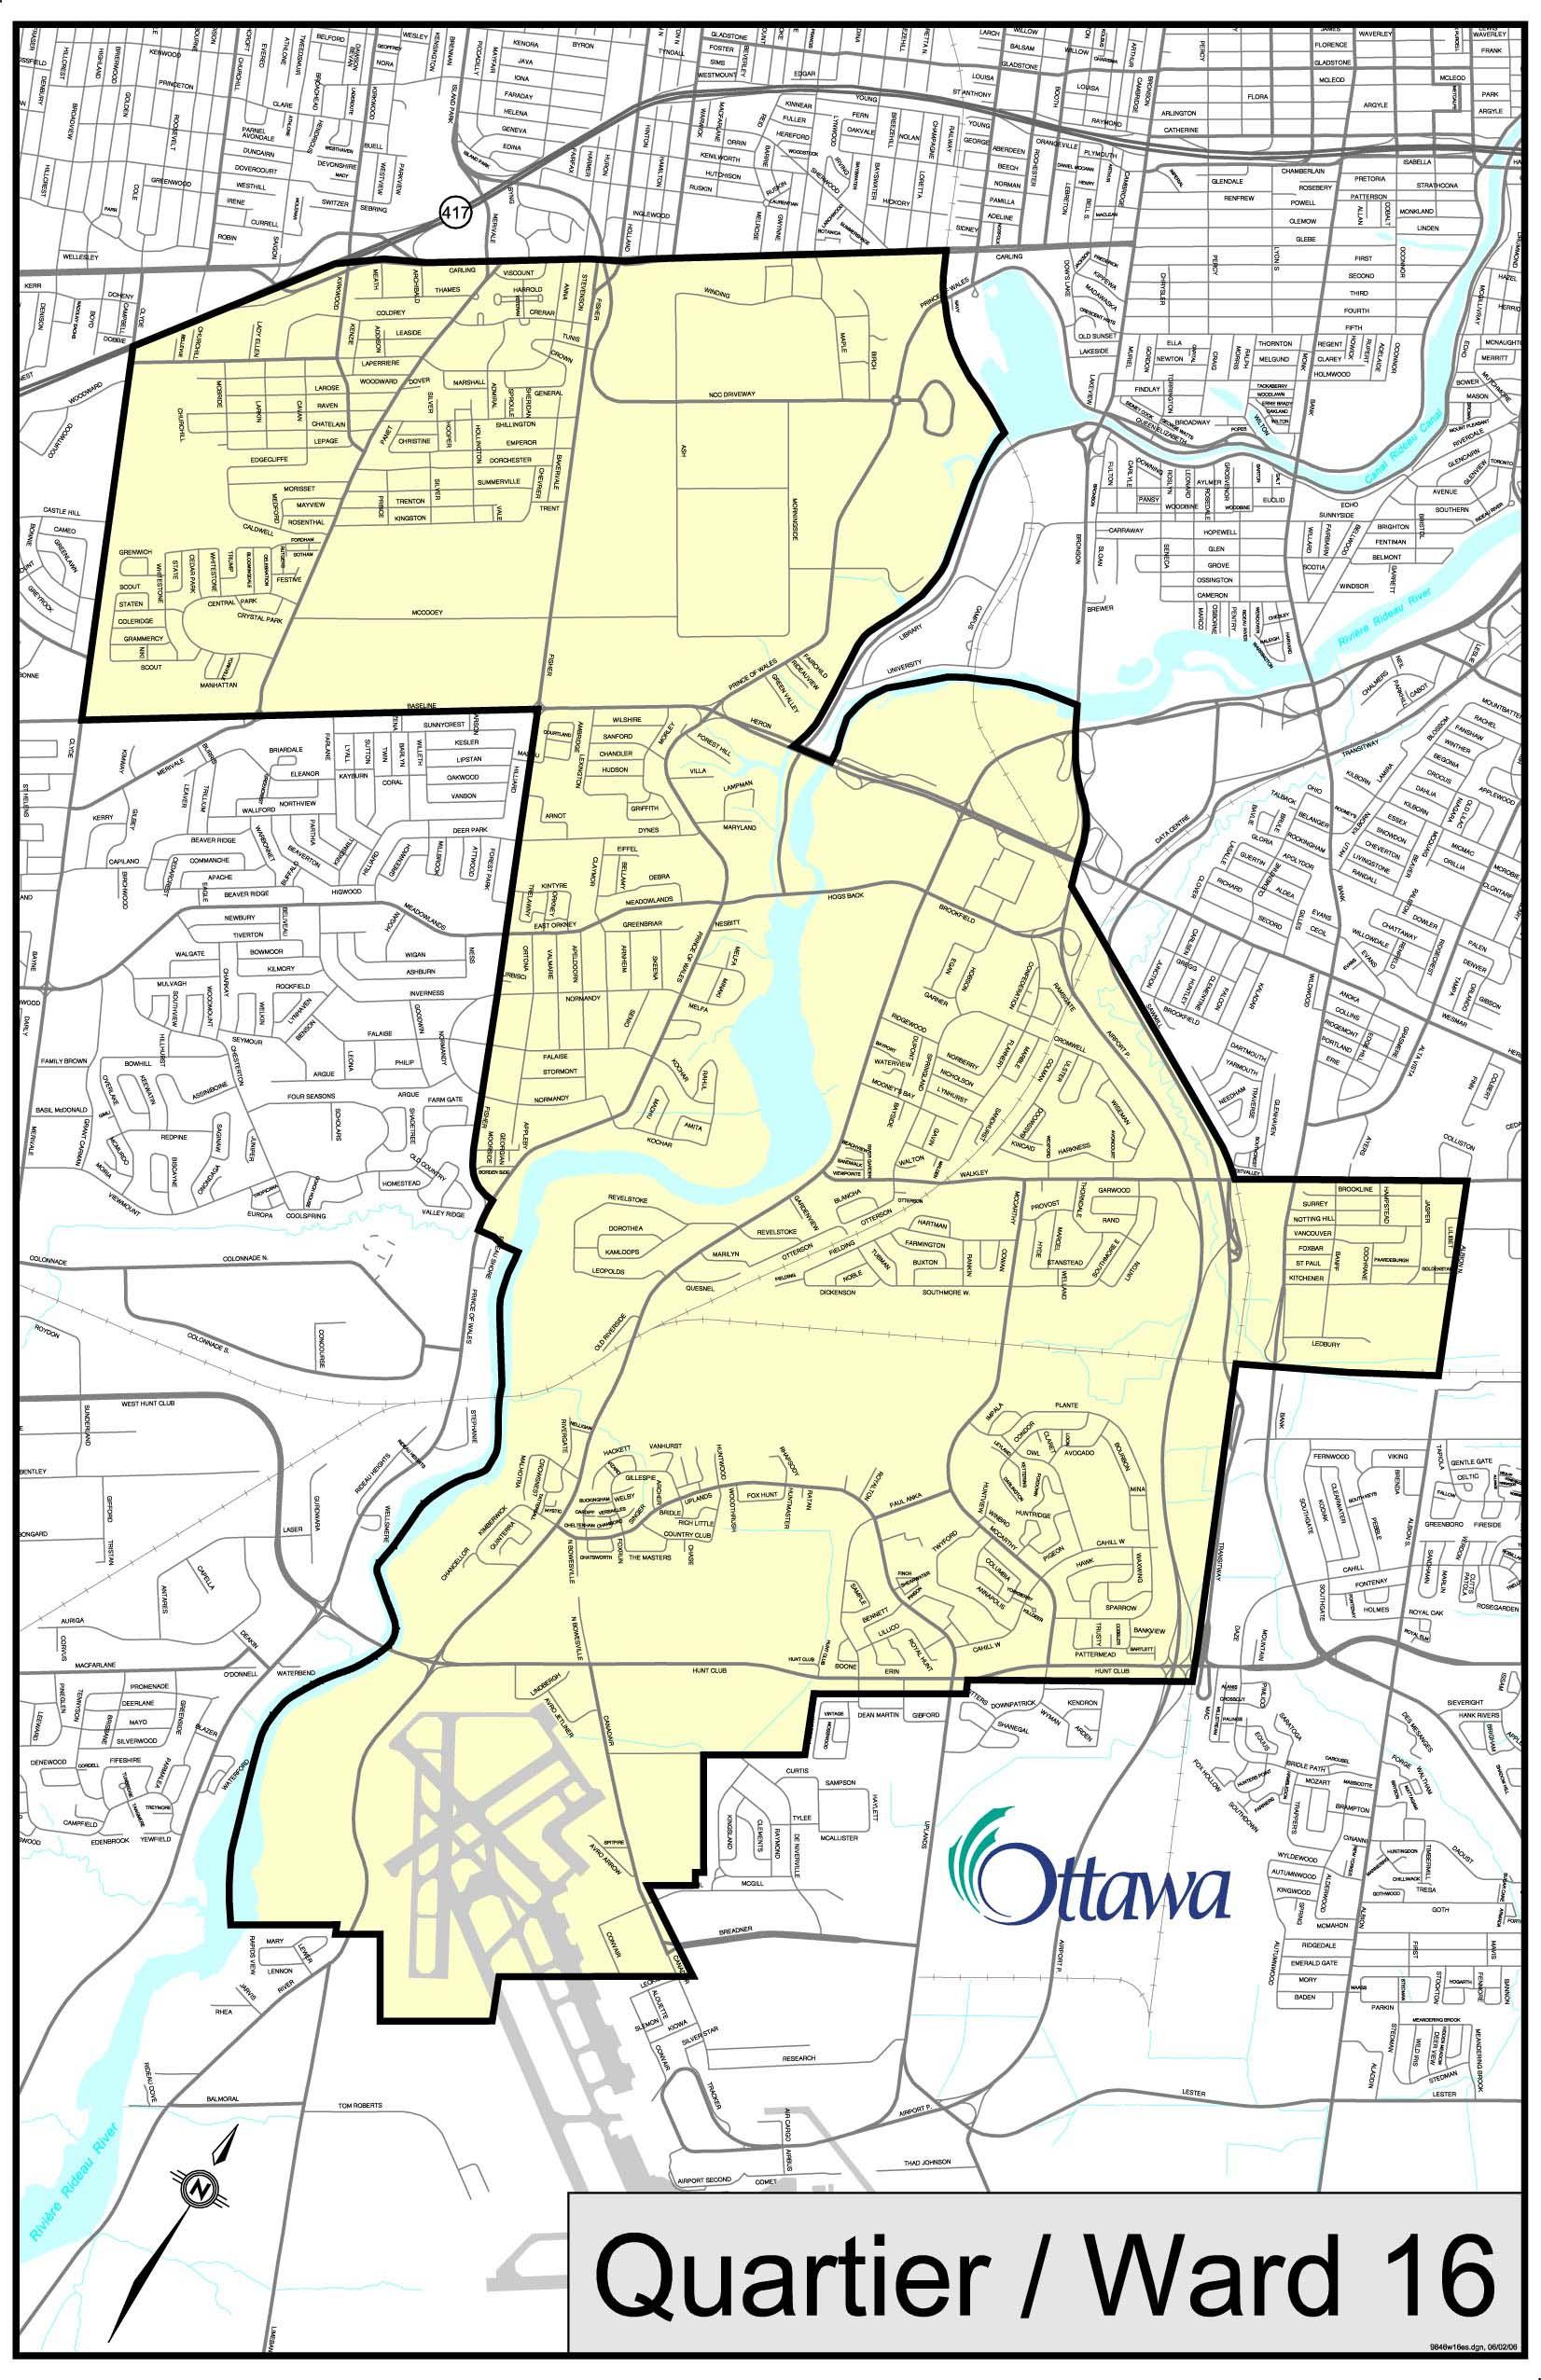 New ward structure and ward maps | City of Ottawa